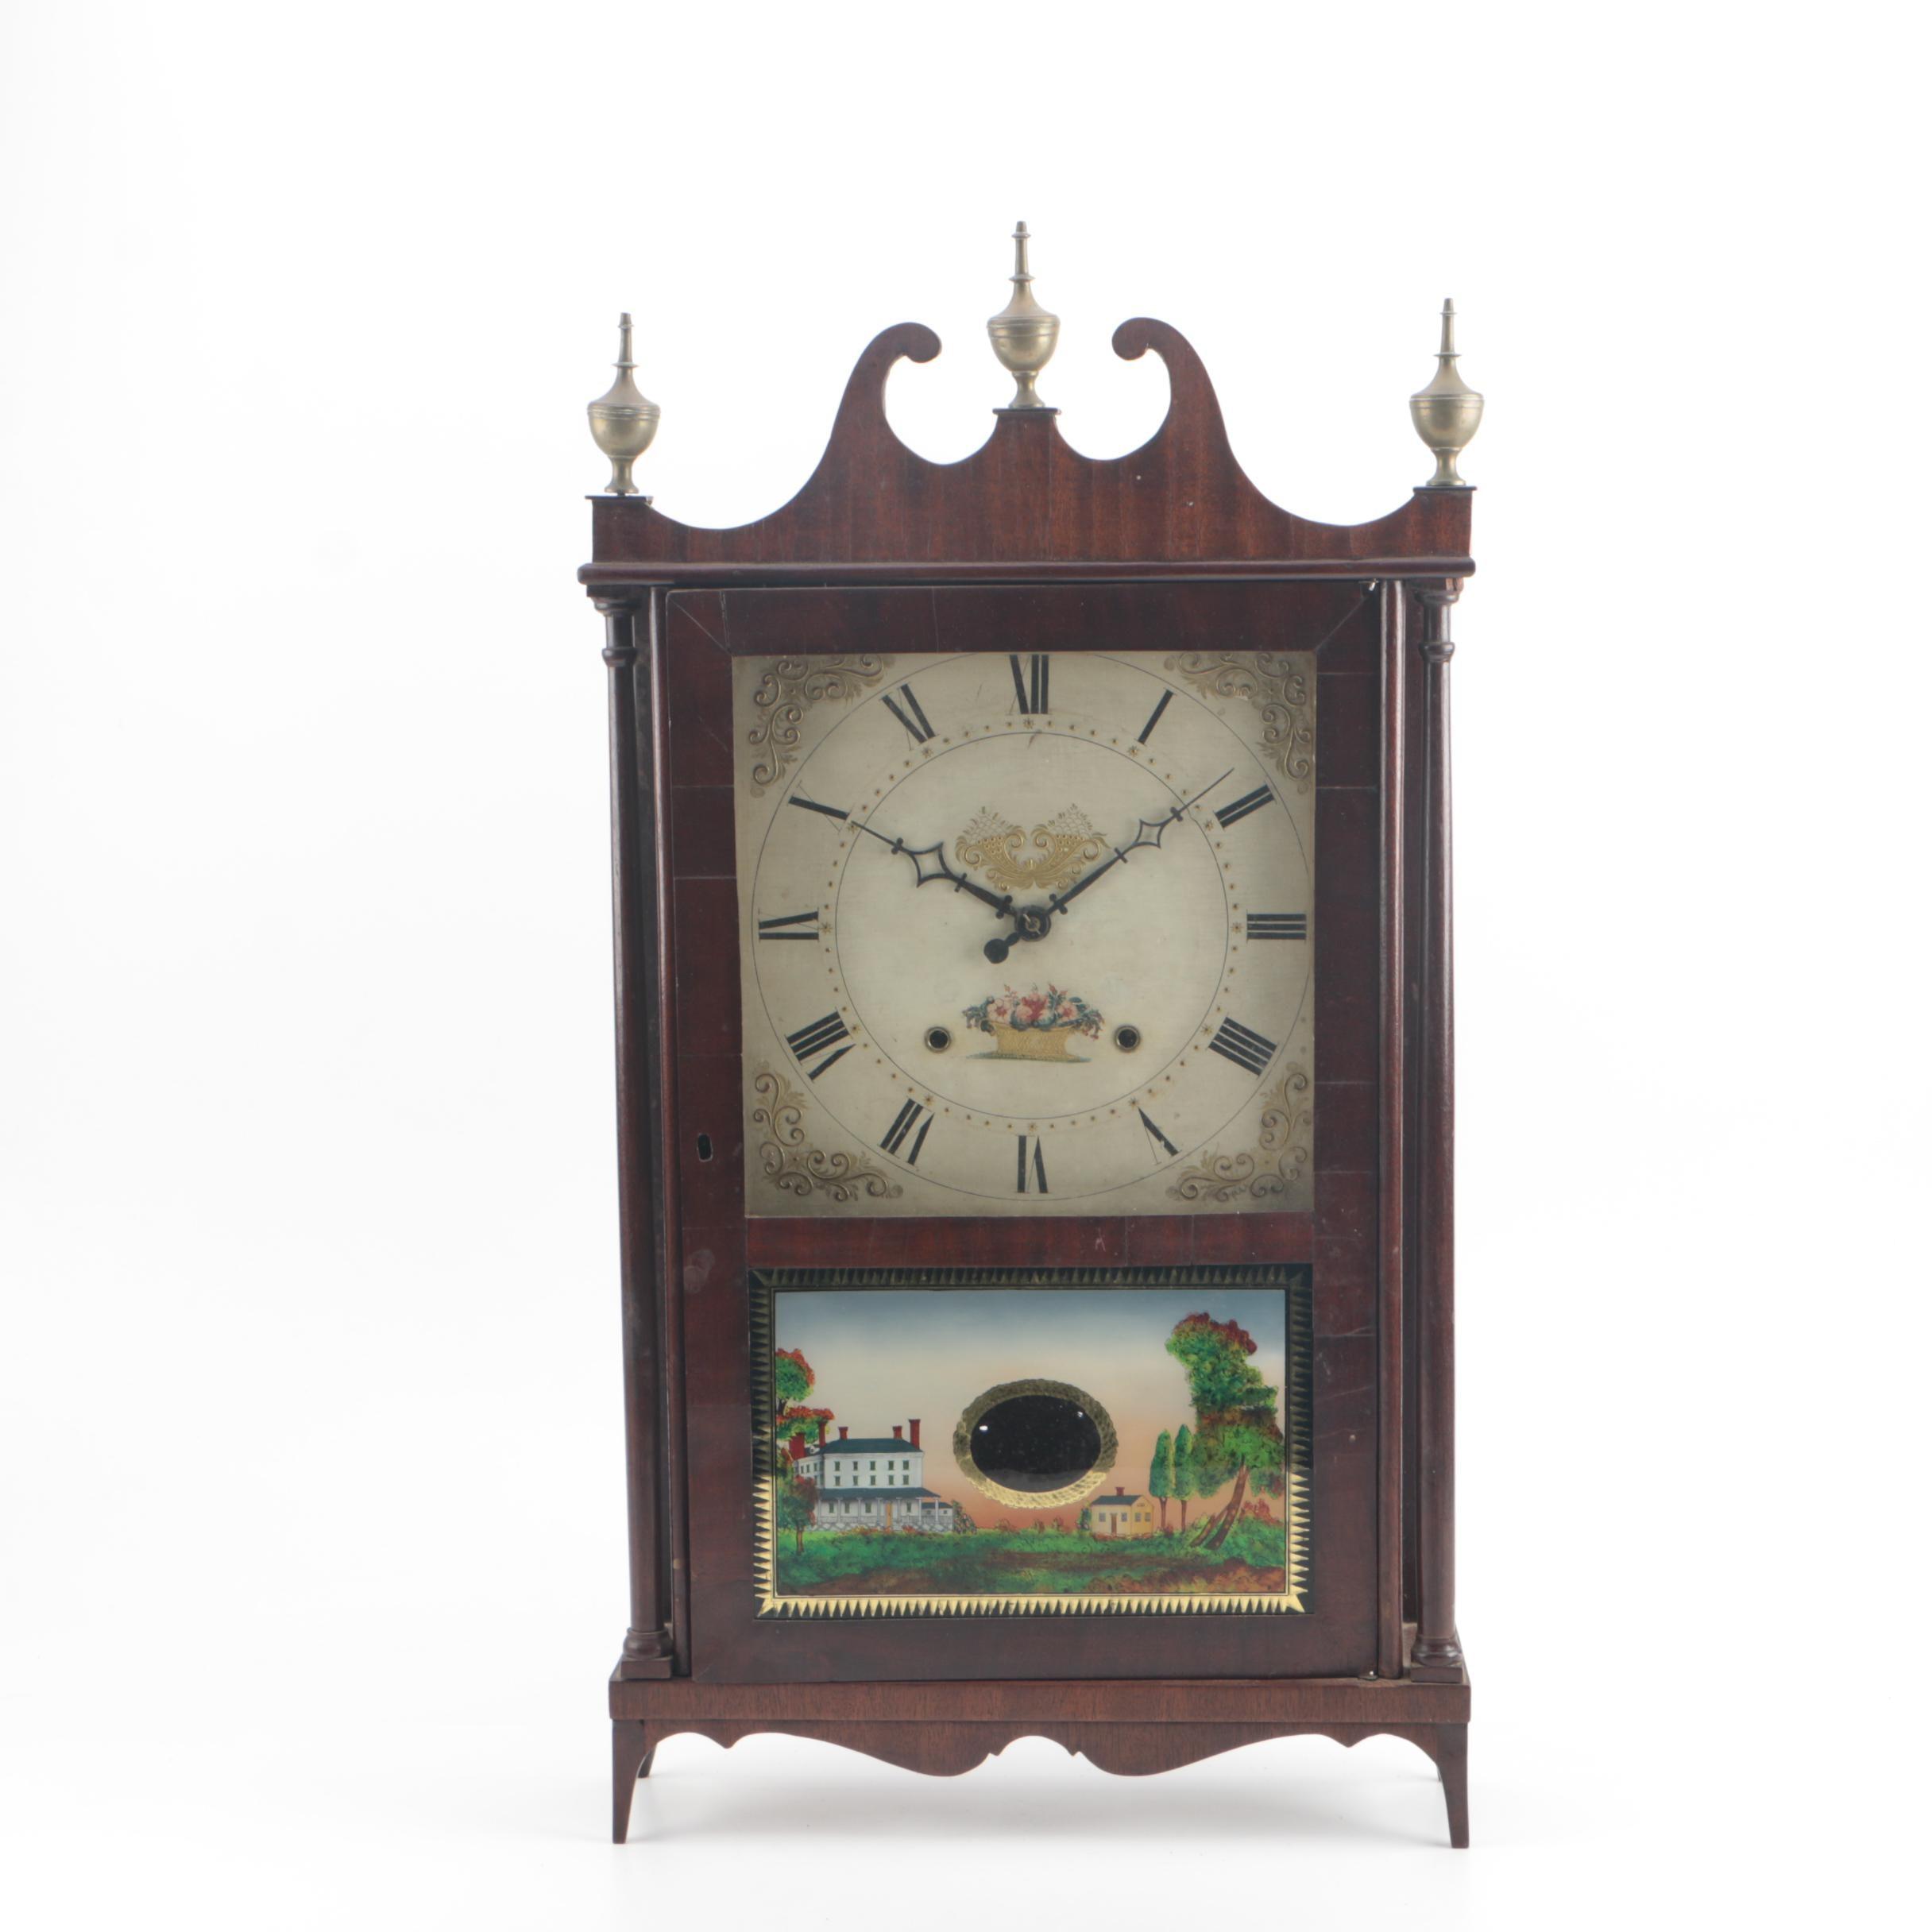 Circa 1830 Eli Terry & Sons Pillar and Scroll Clock